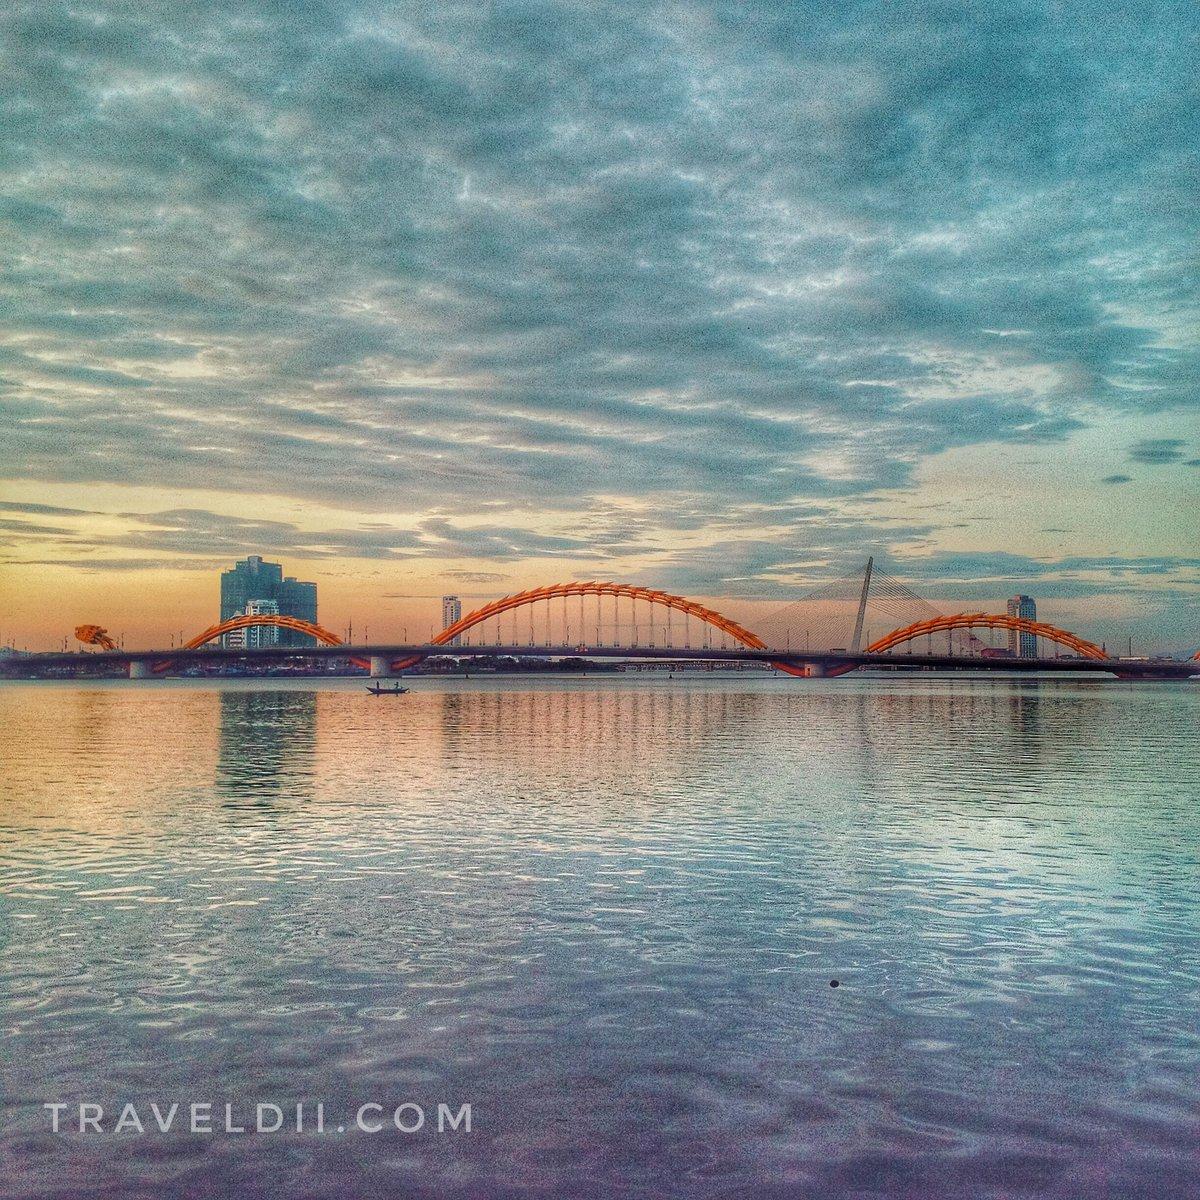 The dragon wakes up!  @traveldii_vn  Your password into locals ---------------------------------------------------------- #Vietnam #vietnamese #danangcity #traveldii_vn #localguides #SoutheastAsia #Asia #dragonbridge #hightlightvietnam #Traveller #traveladdict #experience #loyalpic.twitter.com/o1g6PpMUuo